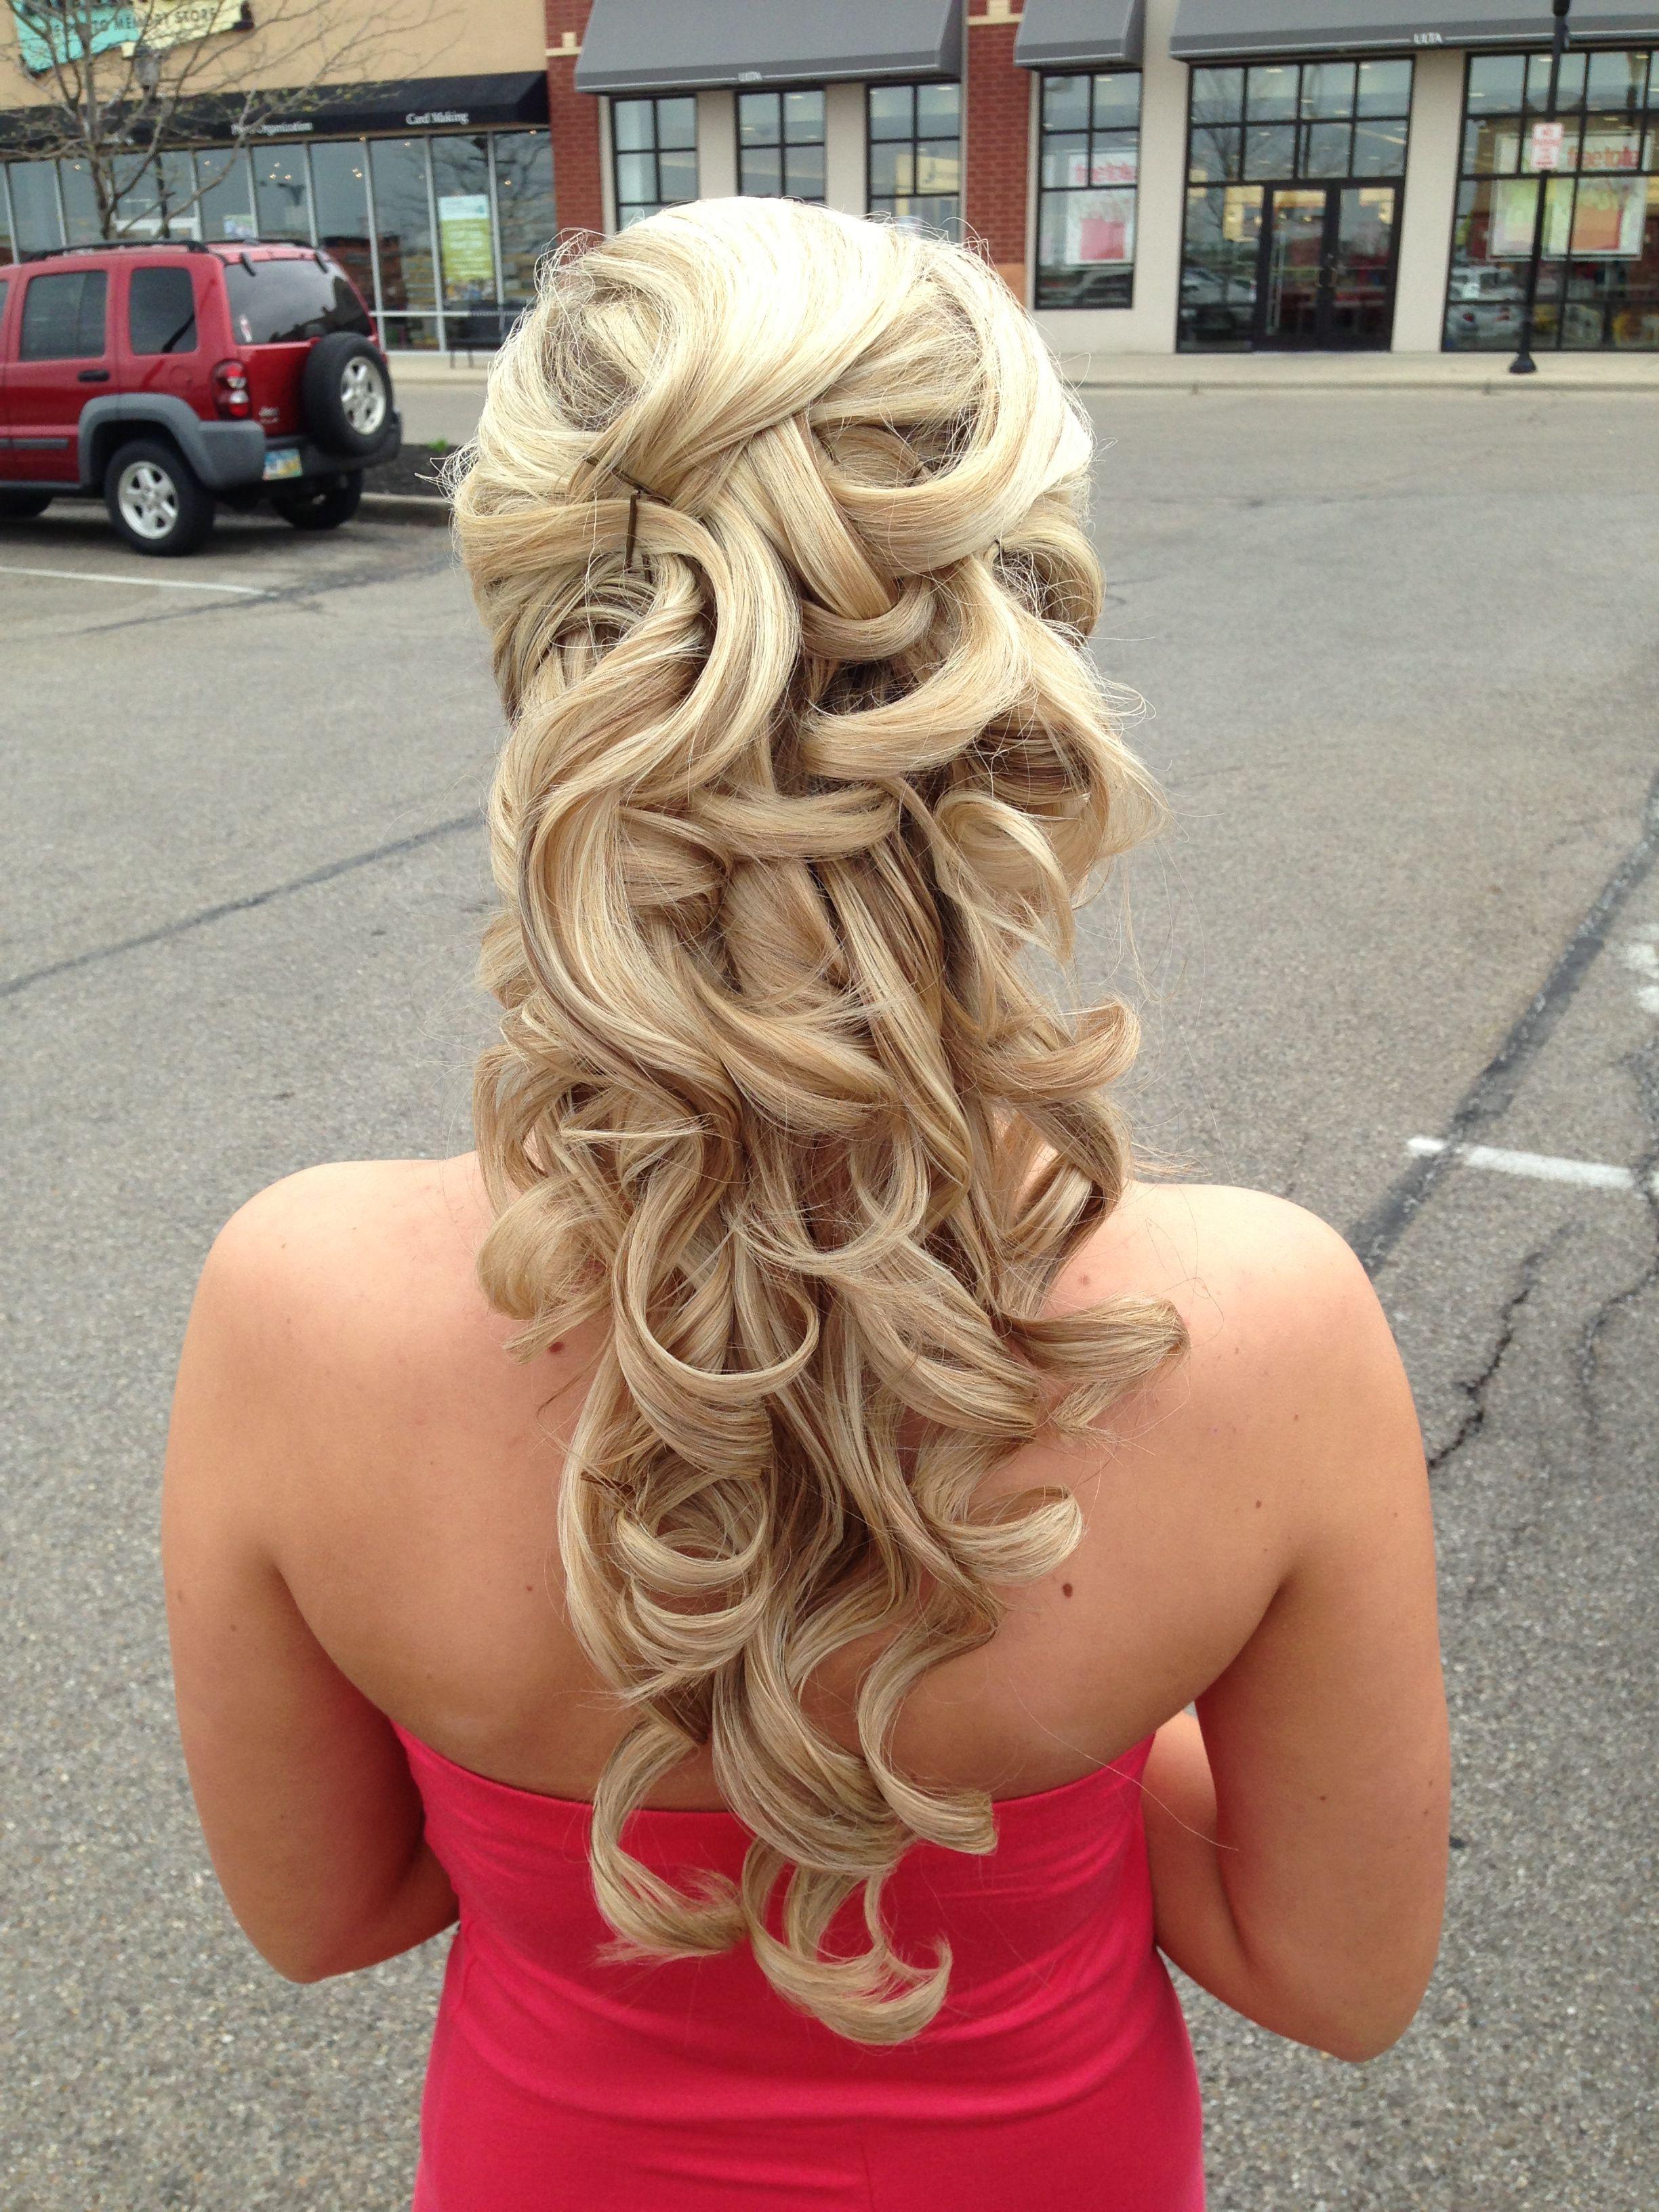 Prom hair half up half down formal pinterest prom hair prom